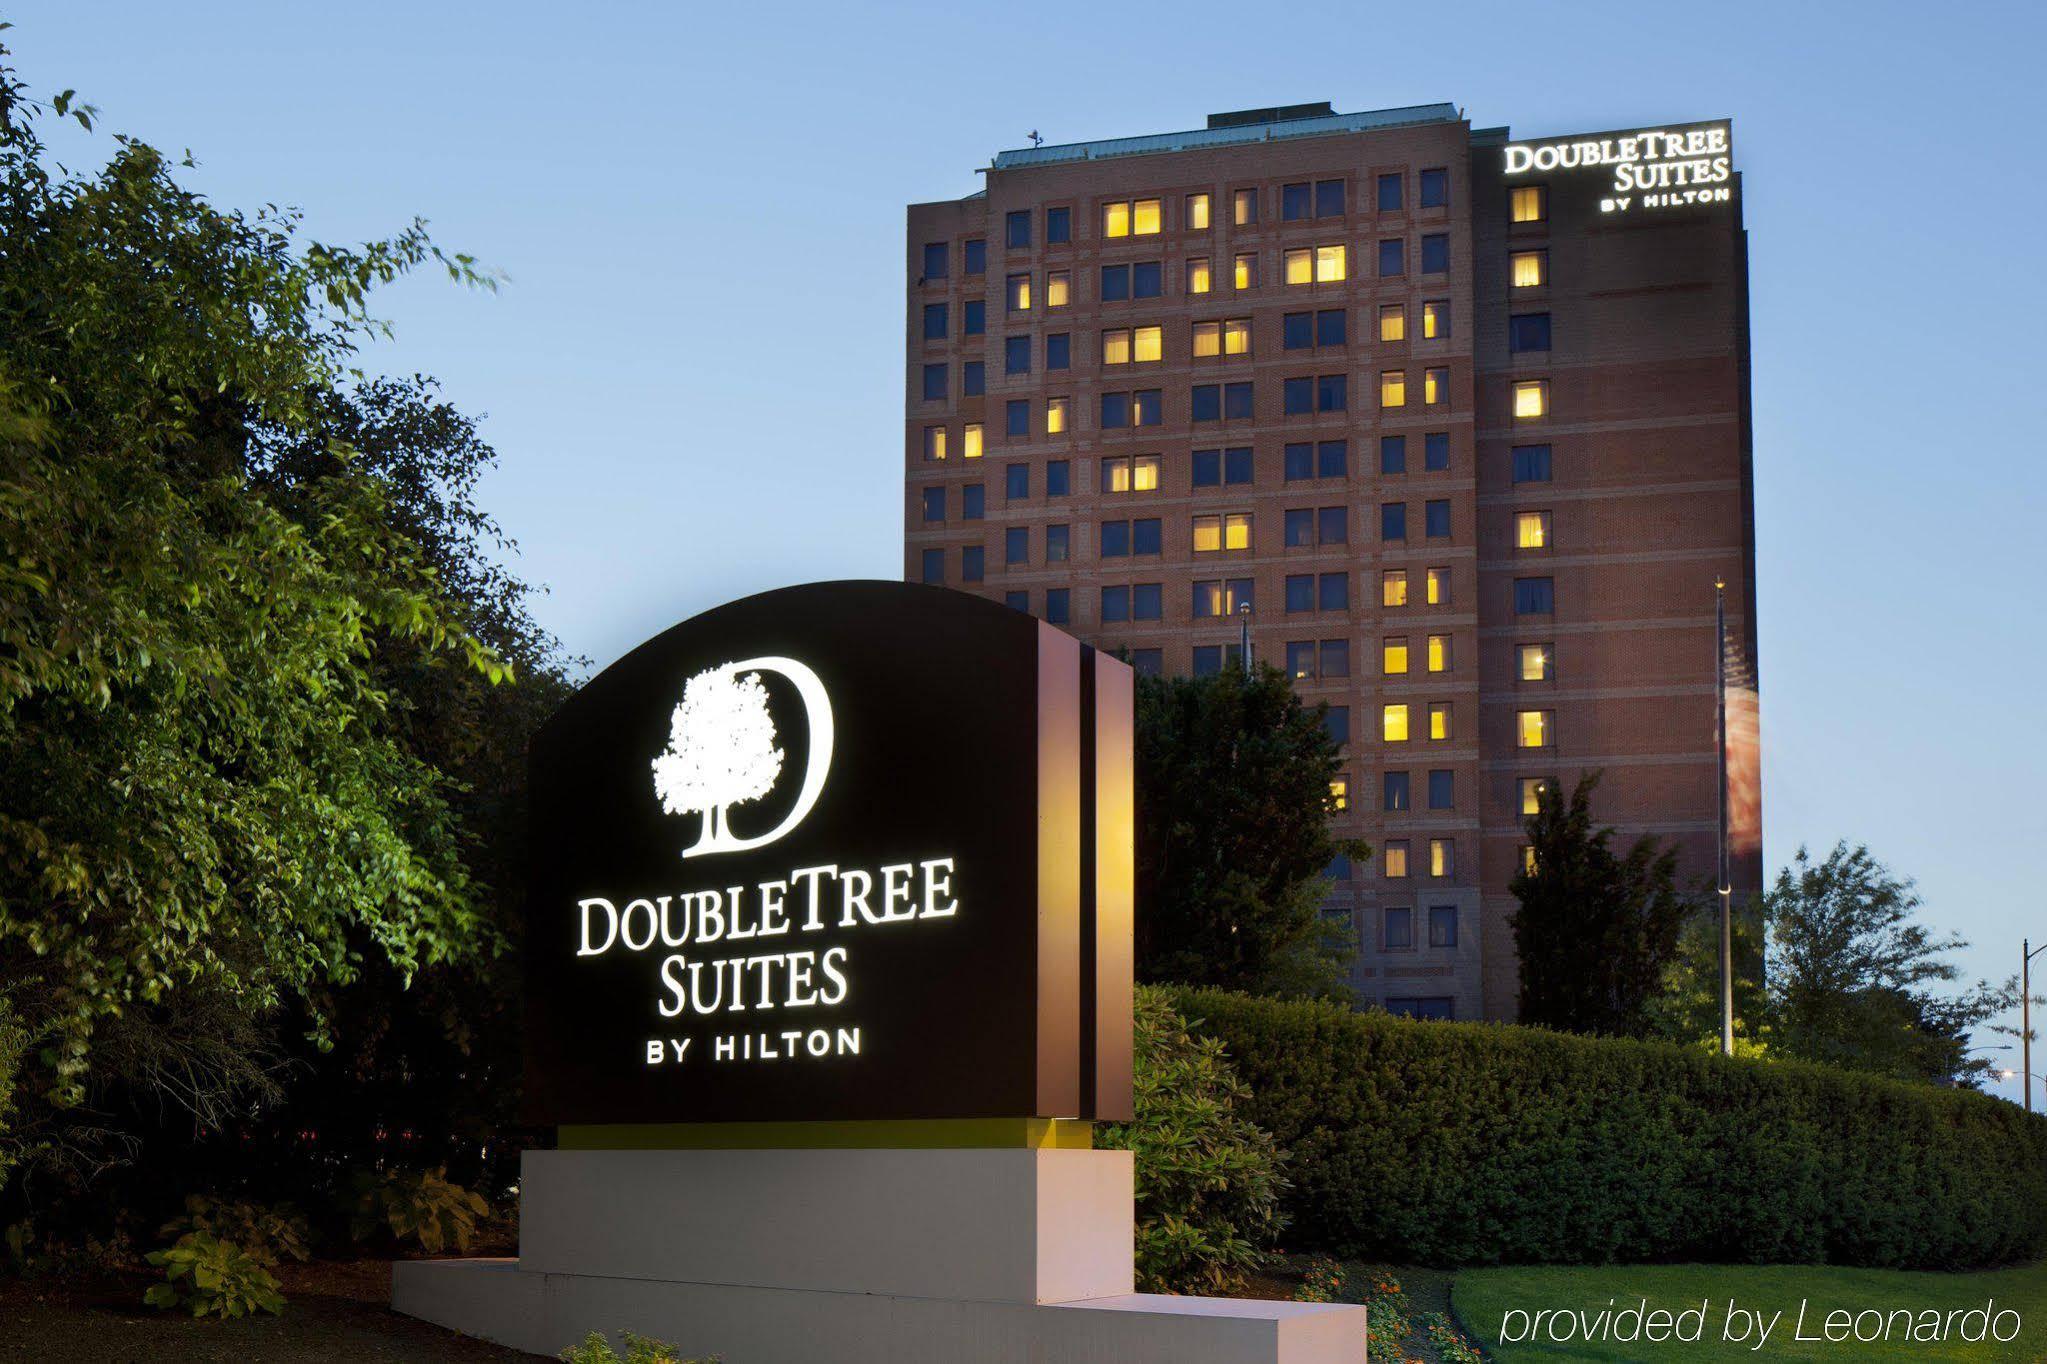 Hotel Boston Map.Doubletree Suites By Hilton Hotel Boston Cambridge